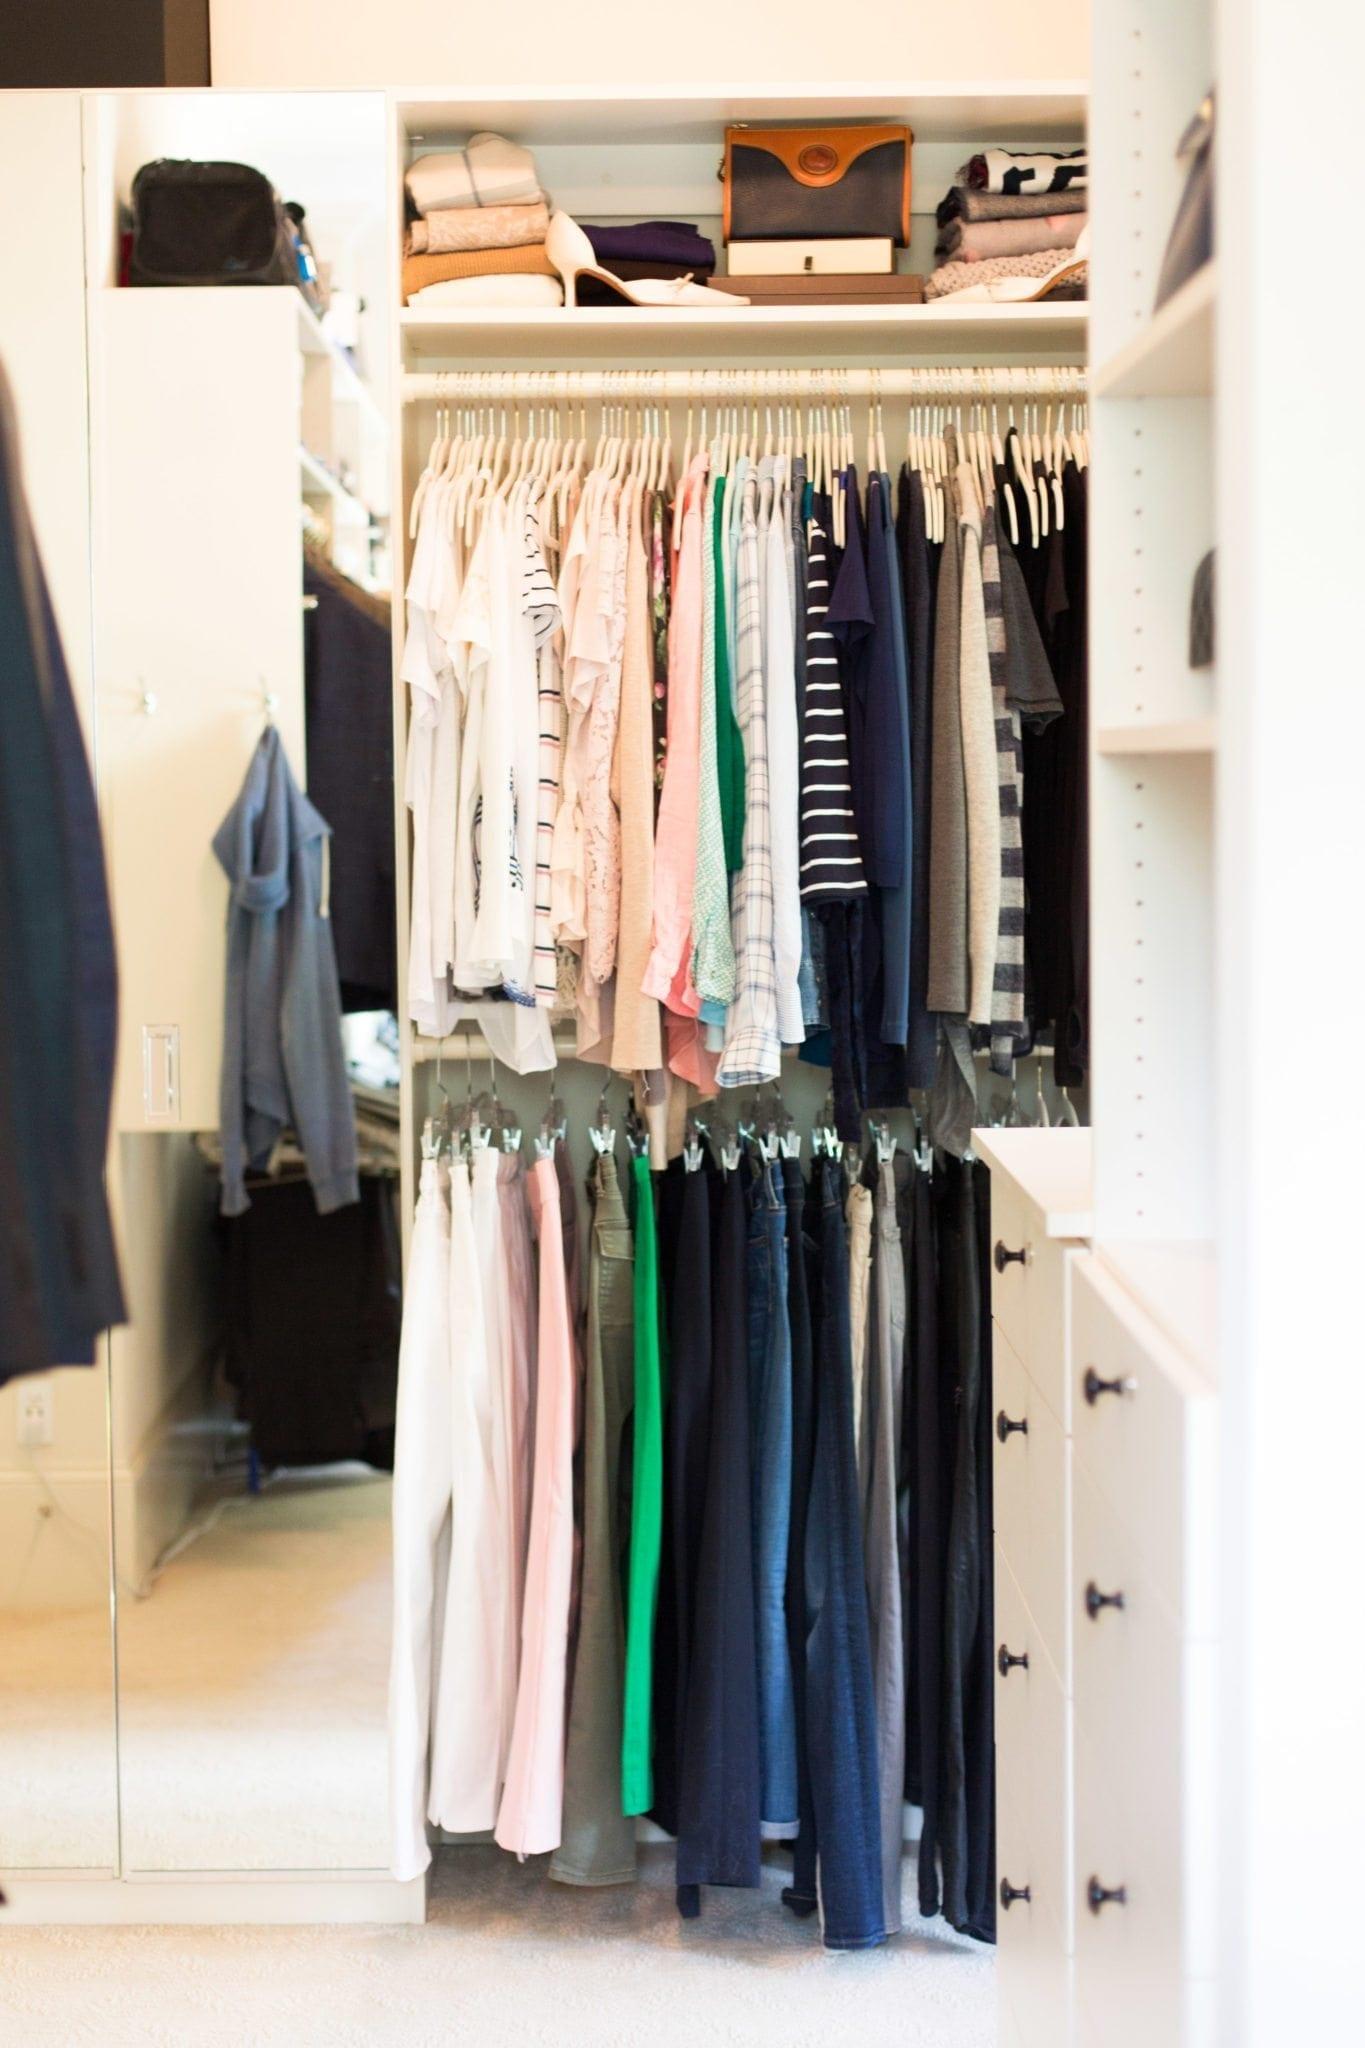 California Closets Atlanta and advice to better arrange closets.